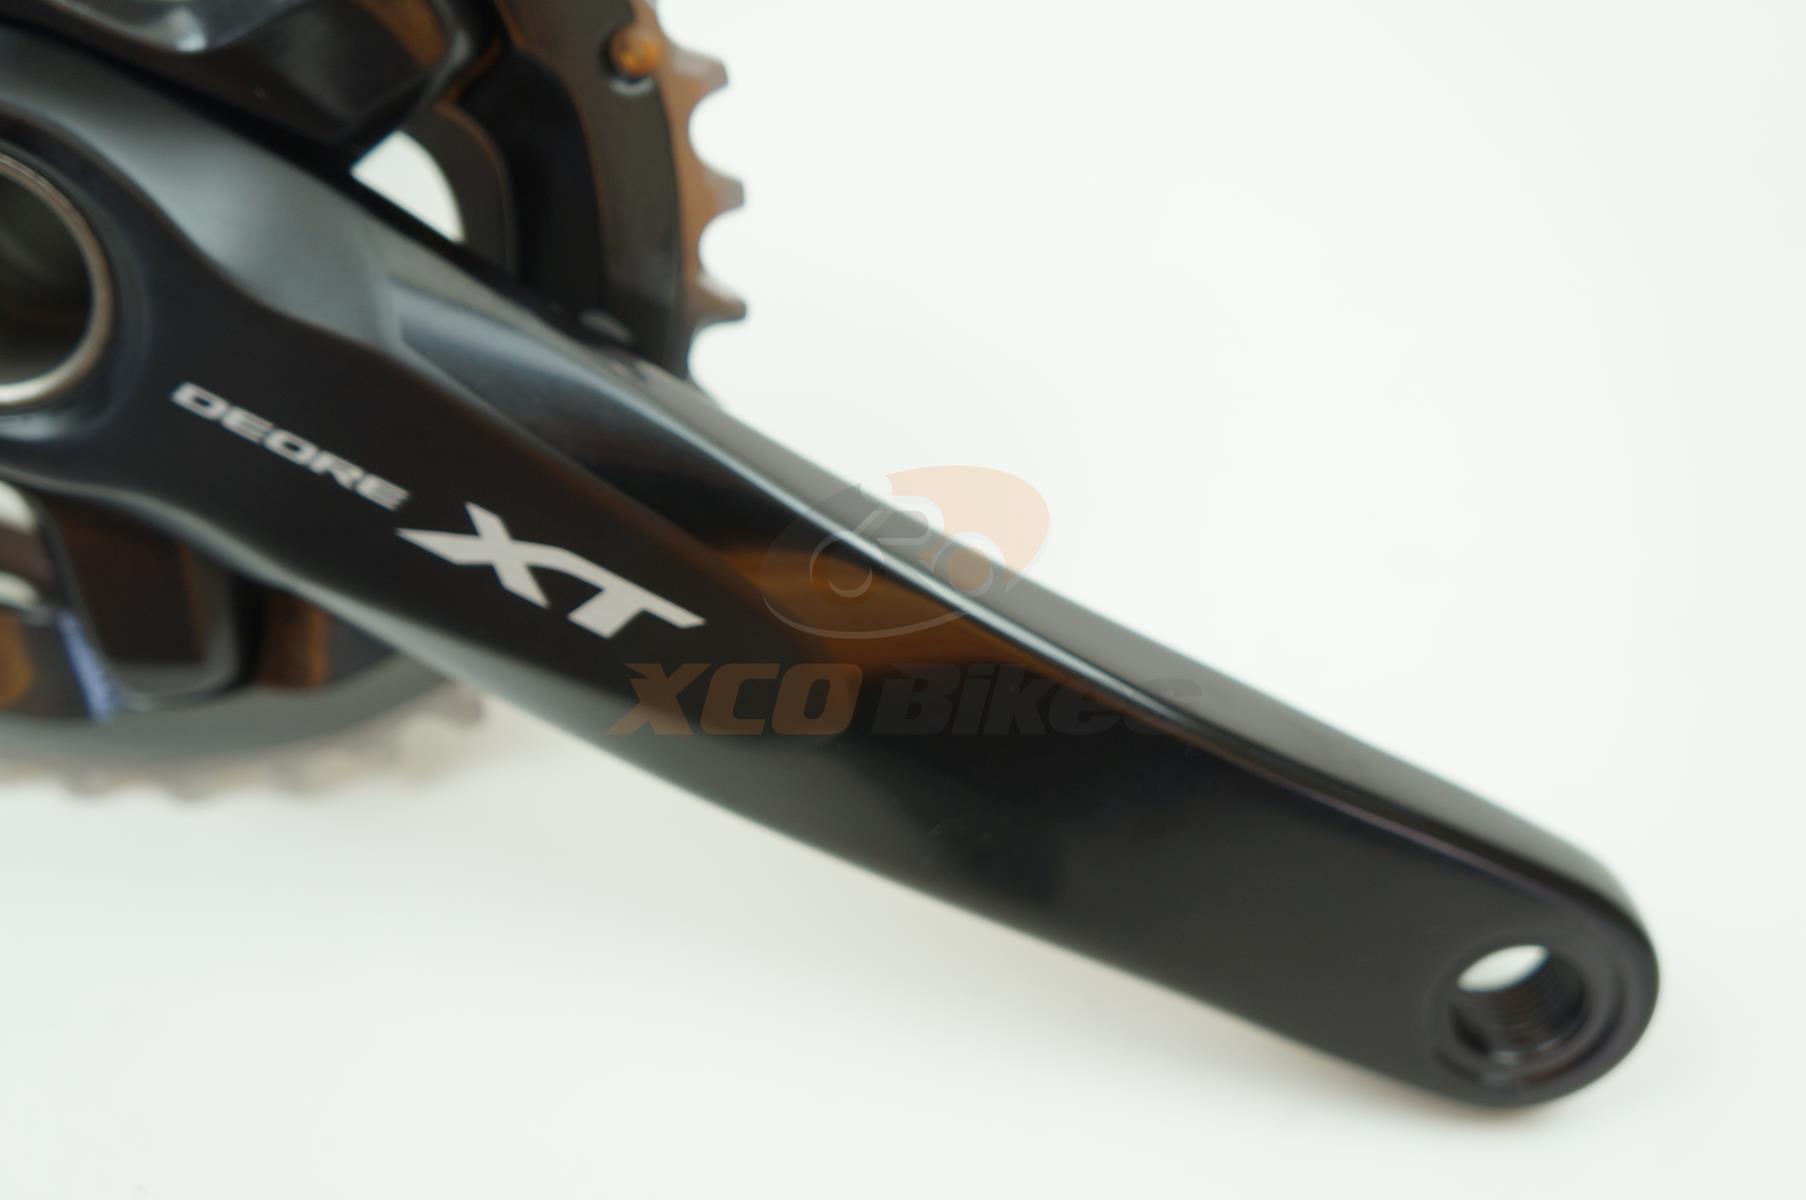 Pedivela Shimano Deore XT M8000 36-26 175mm 2x11 velocidades